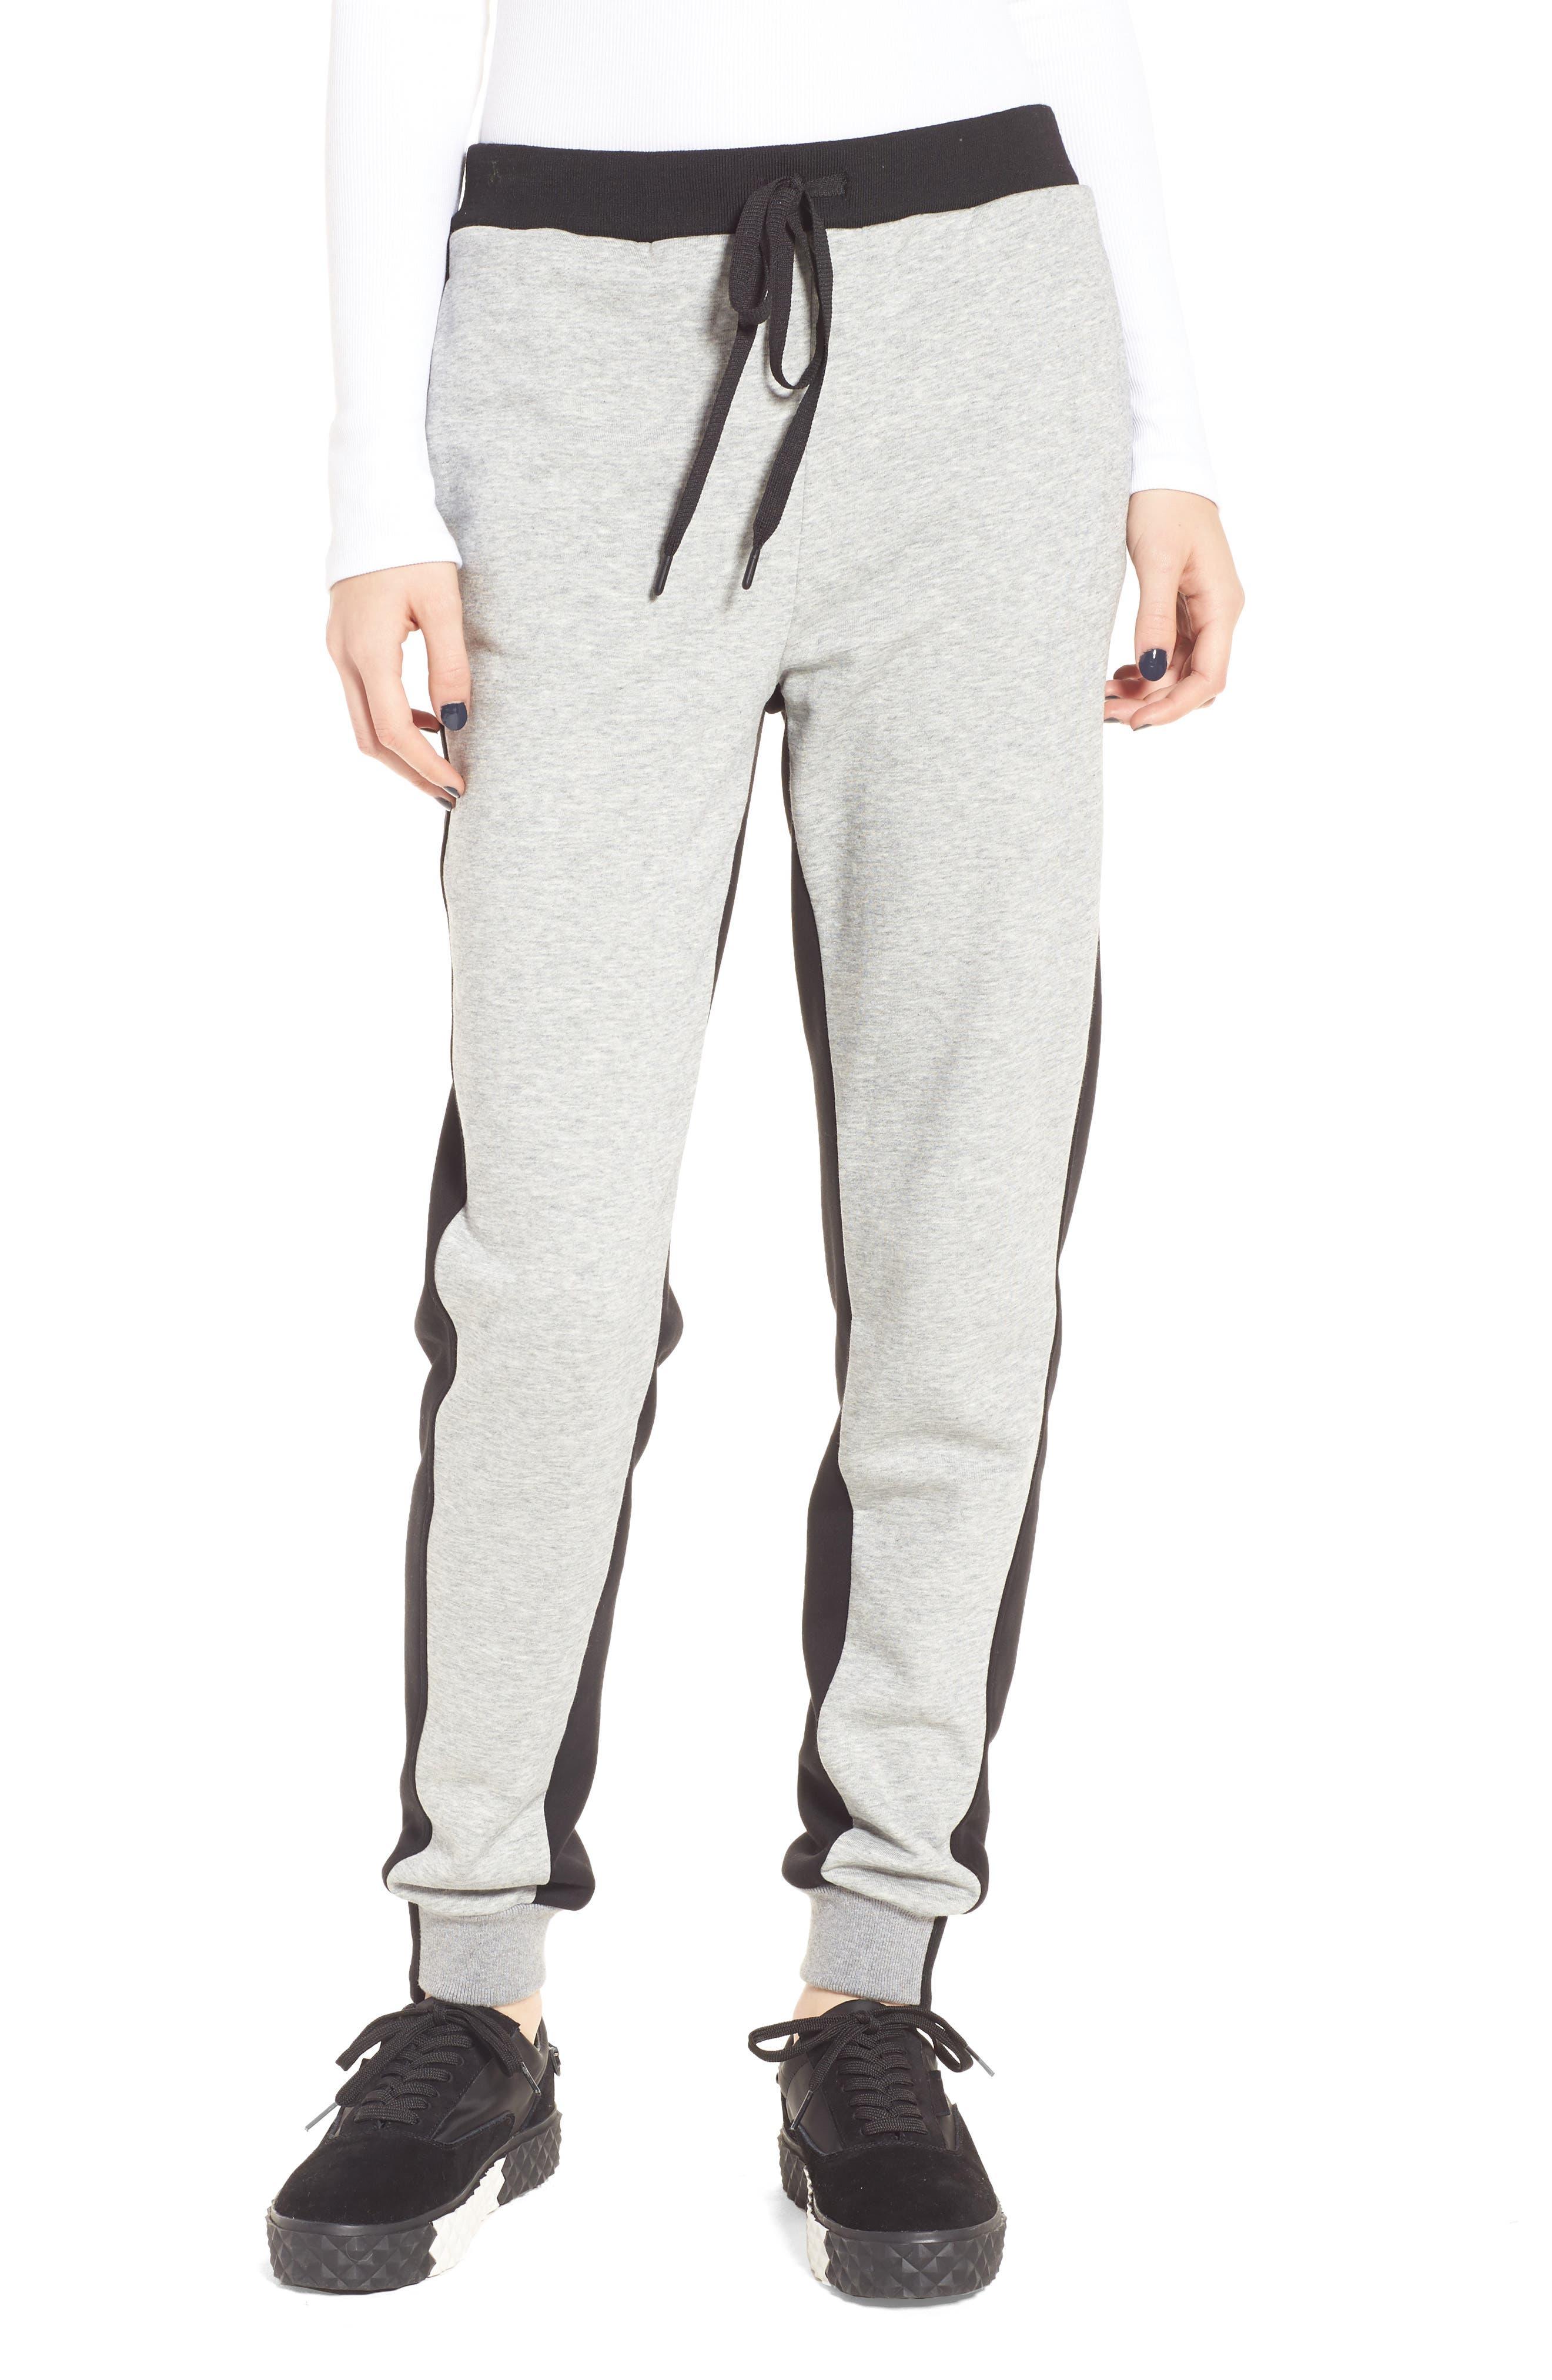 Paneled Sweatpants,                             Main thumbnail 1, color,                             Black/ Med. Heather Grey